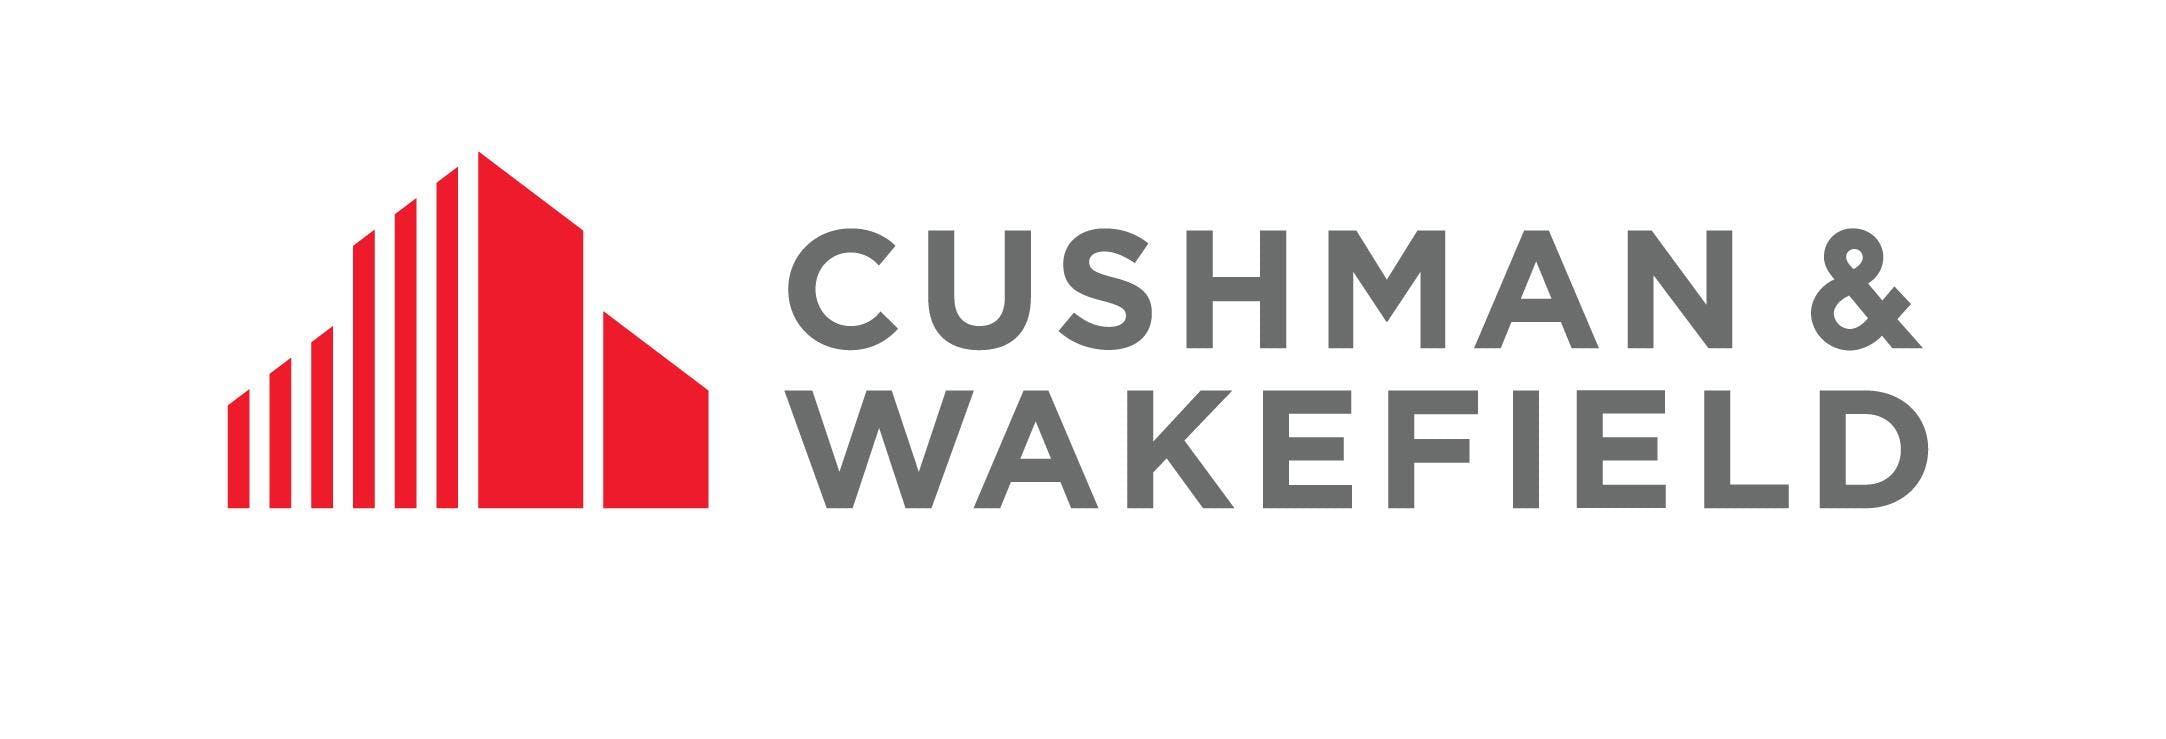 RREF Evening Lecture Series - Cushman & Wakef